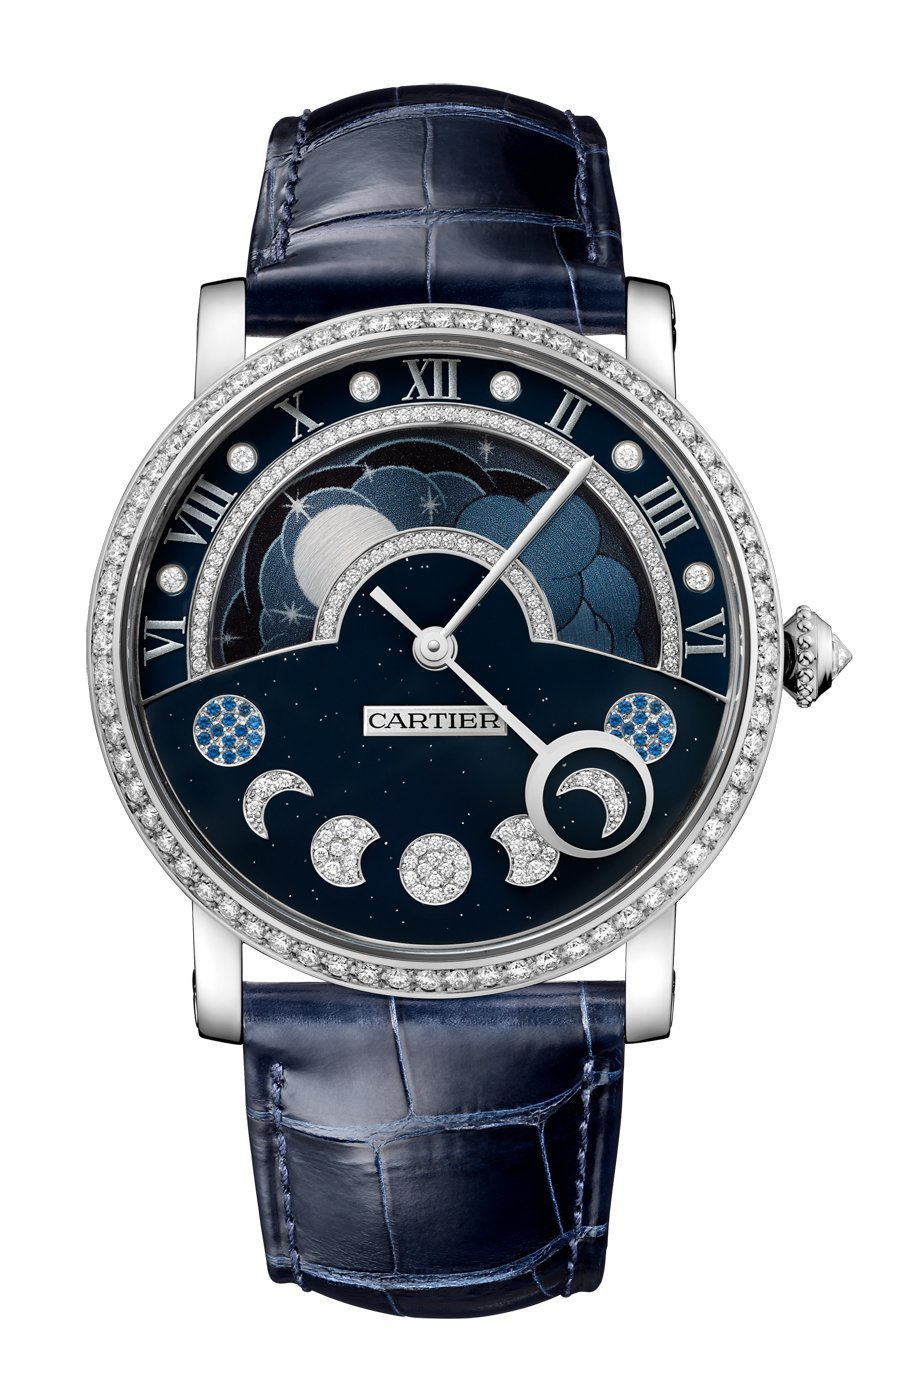 Cartier: Rotonde de Cartier Tag/Nacht retrograde Mondphase